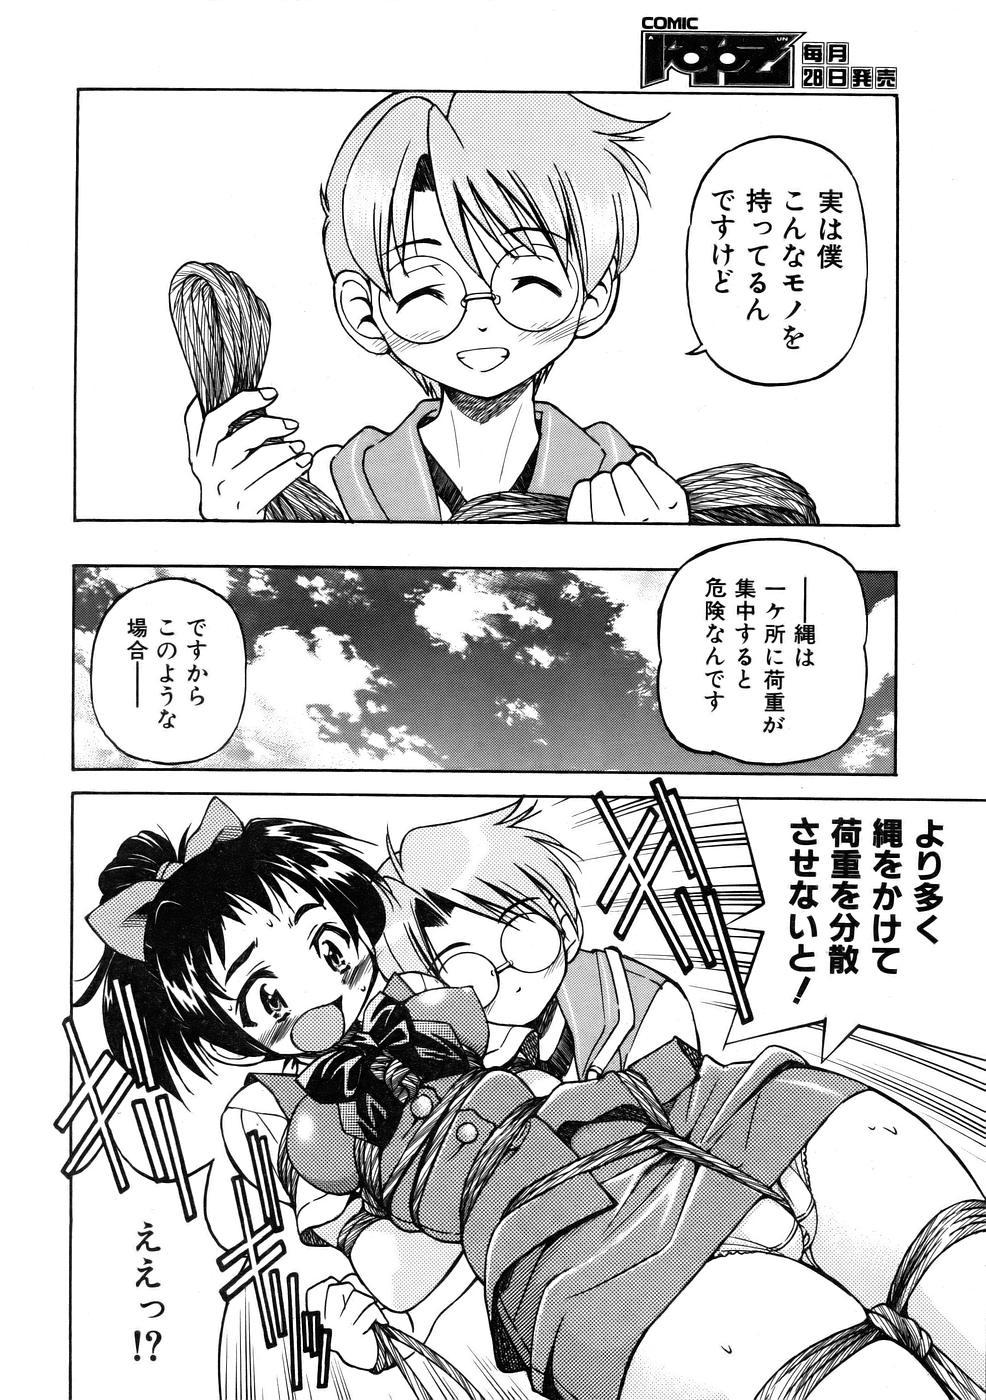 COMIC AUN 2005-10 Vol. 113 213